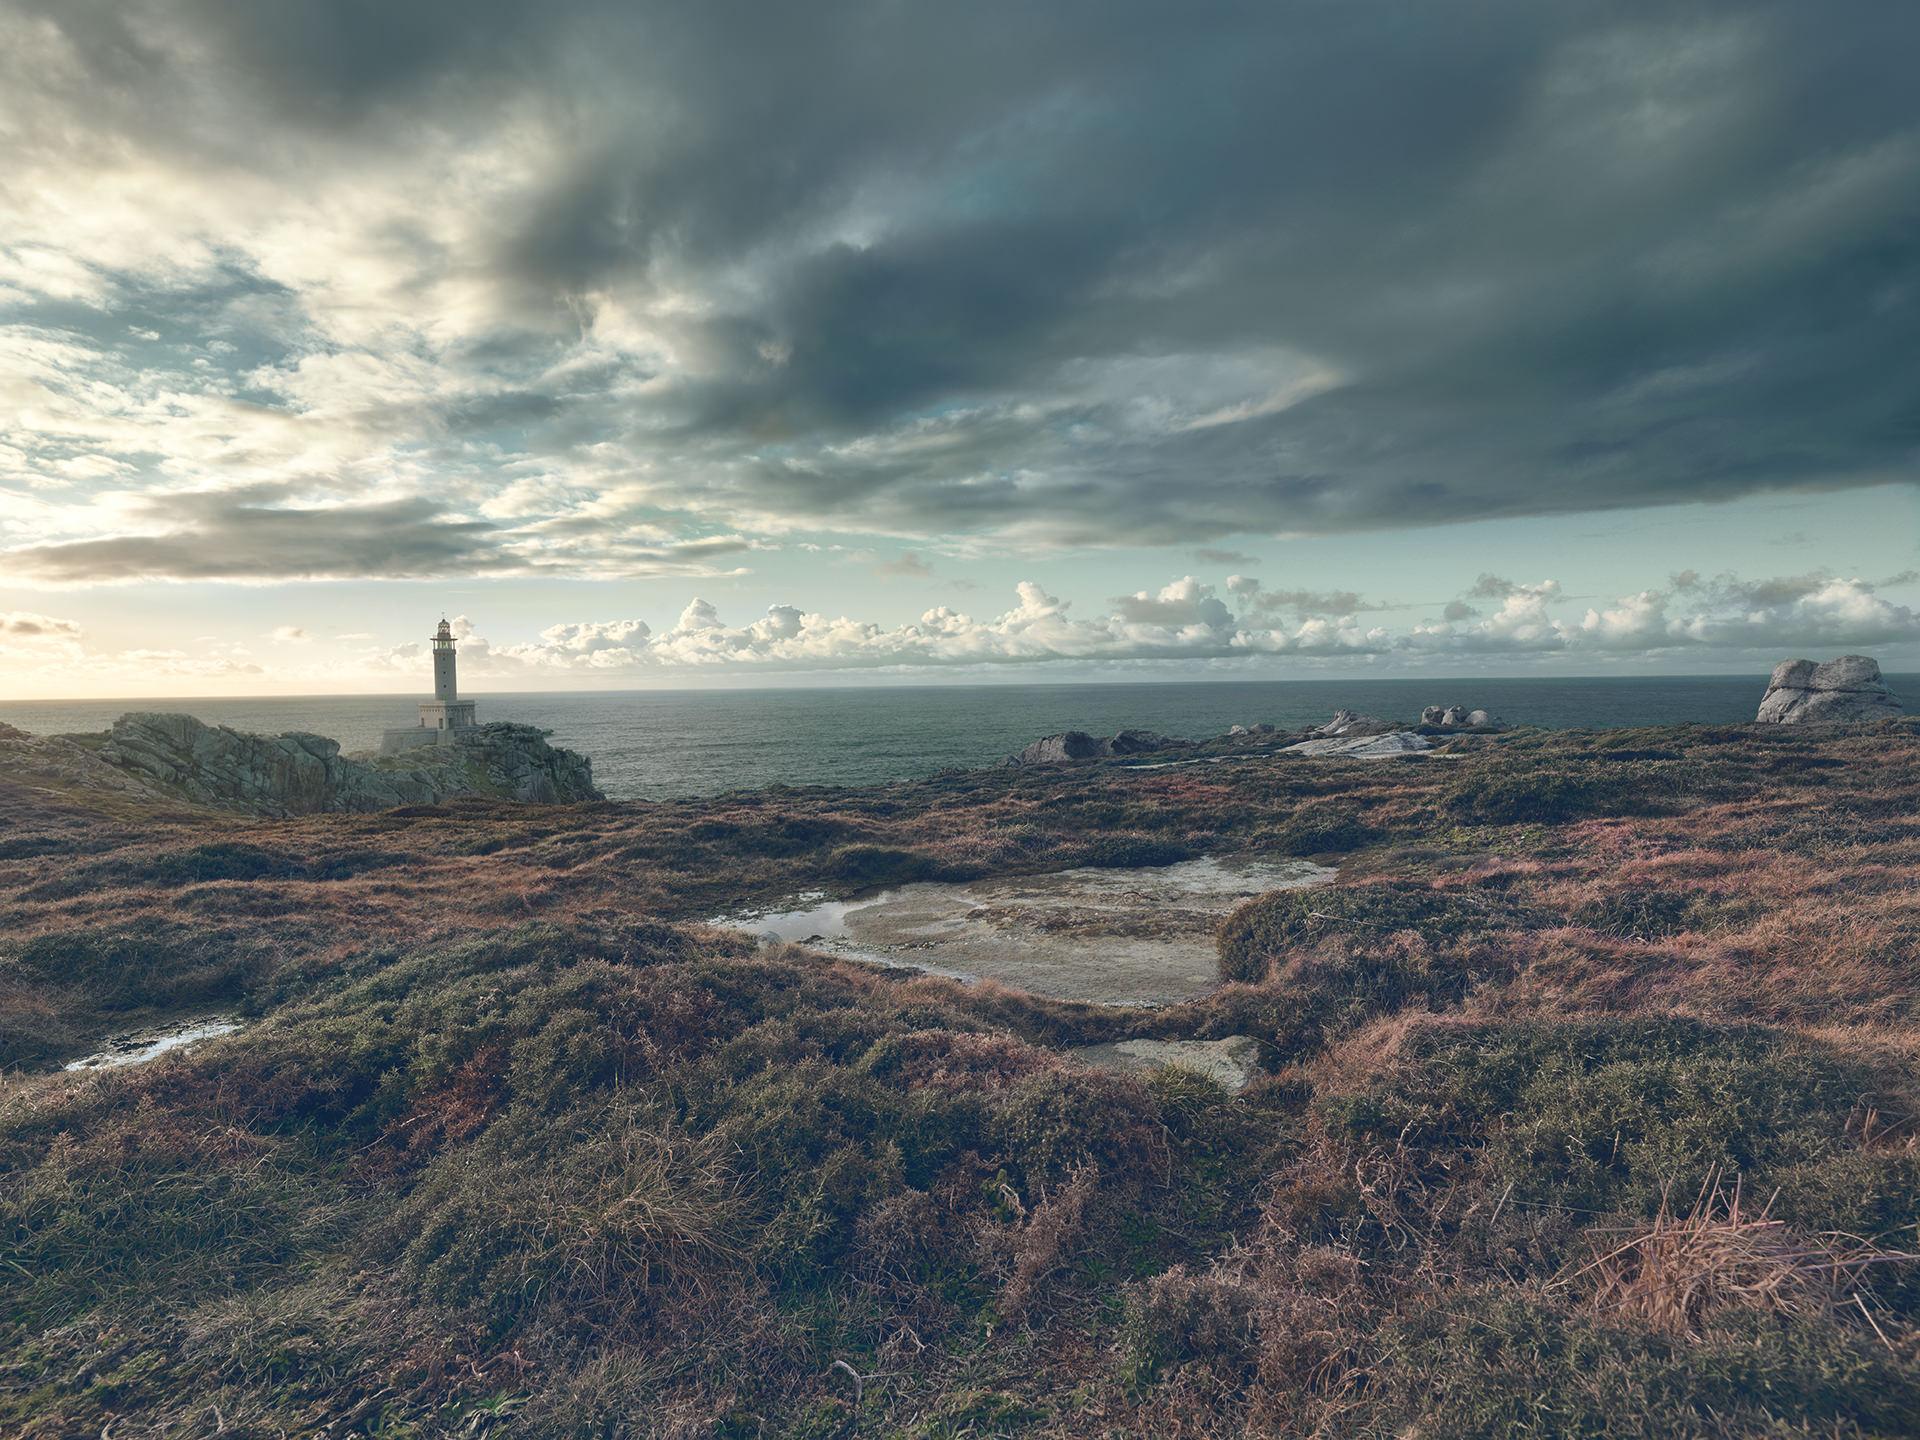 ©ankeluckmann1720, coast, galicia, green, landscape, rocks, spain, anke luckmann, www.ankeluckmann.com, lighthouse